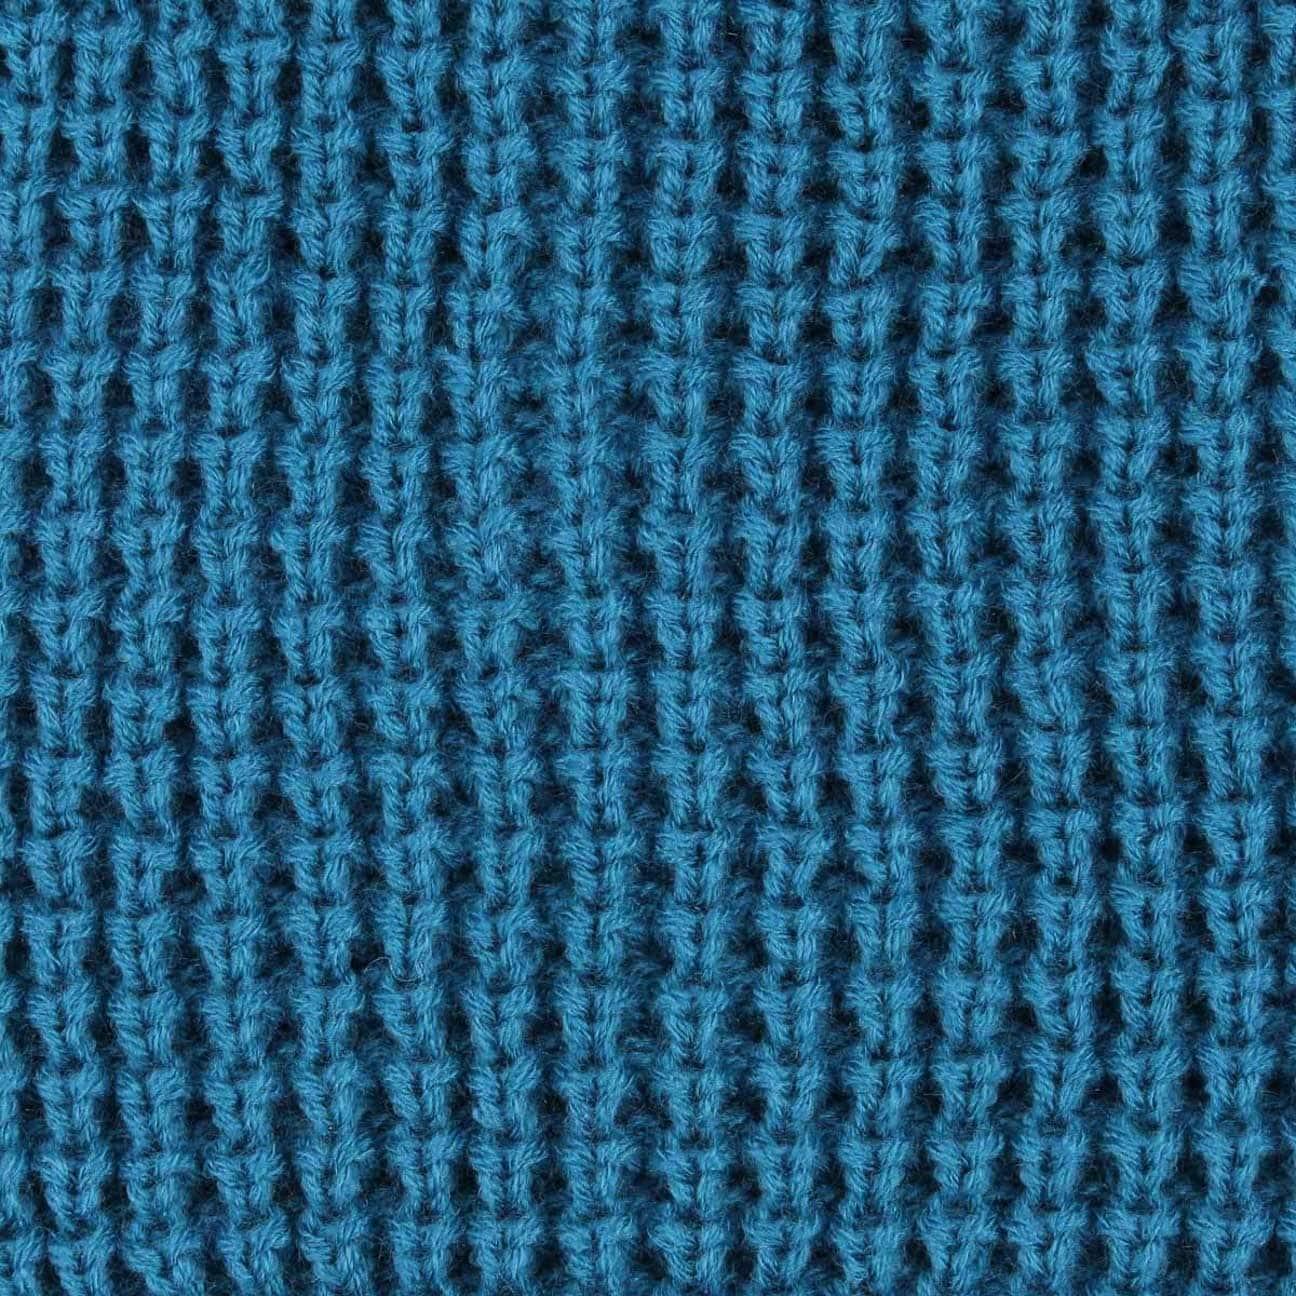 Haciender Knit Beanie by Bench, GBP 15,95 --  Hats, caps   beanies ... 1bd4506a27